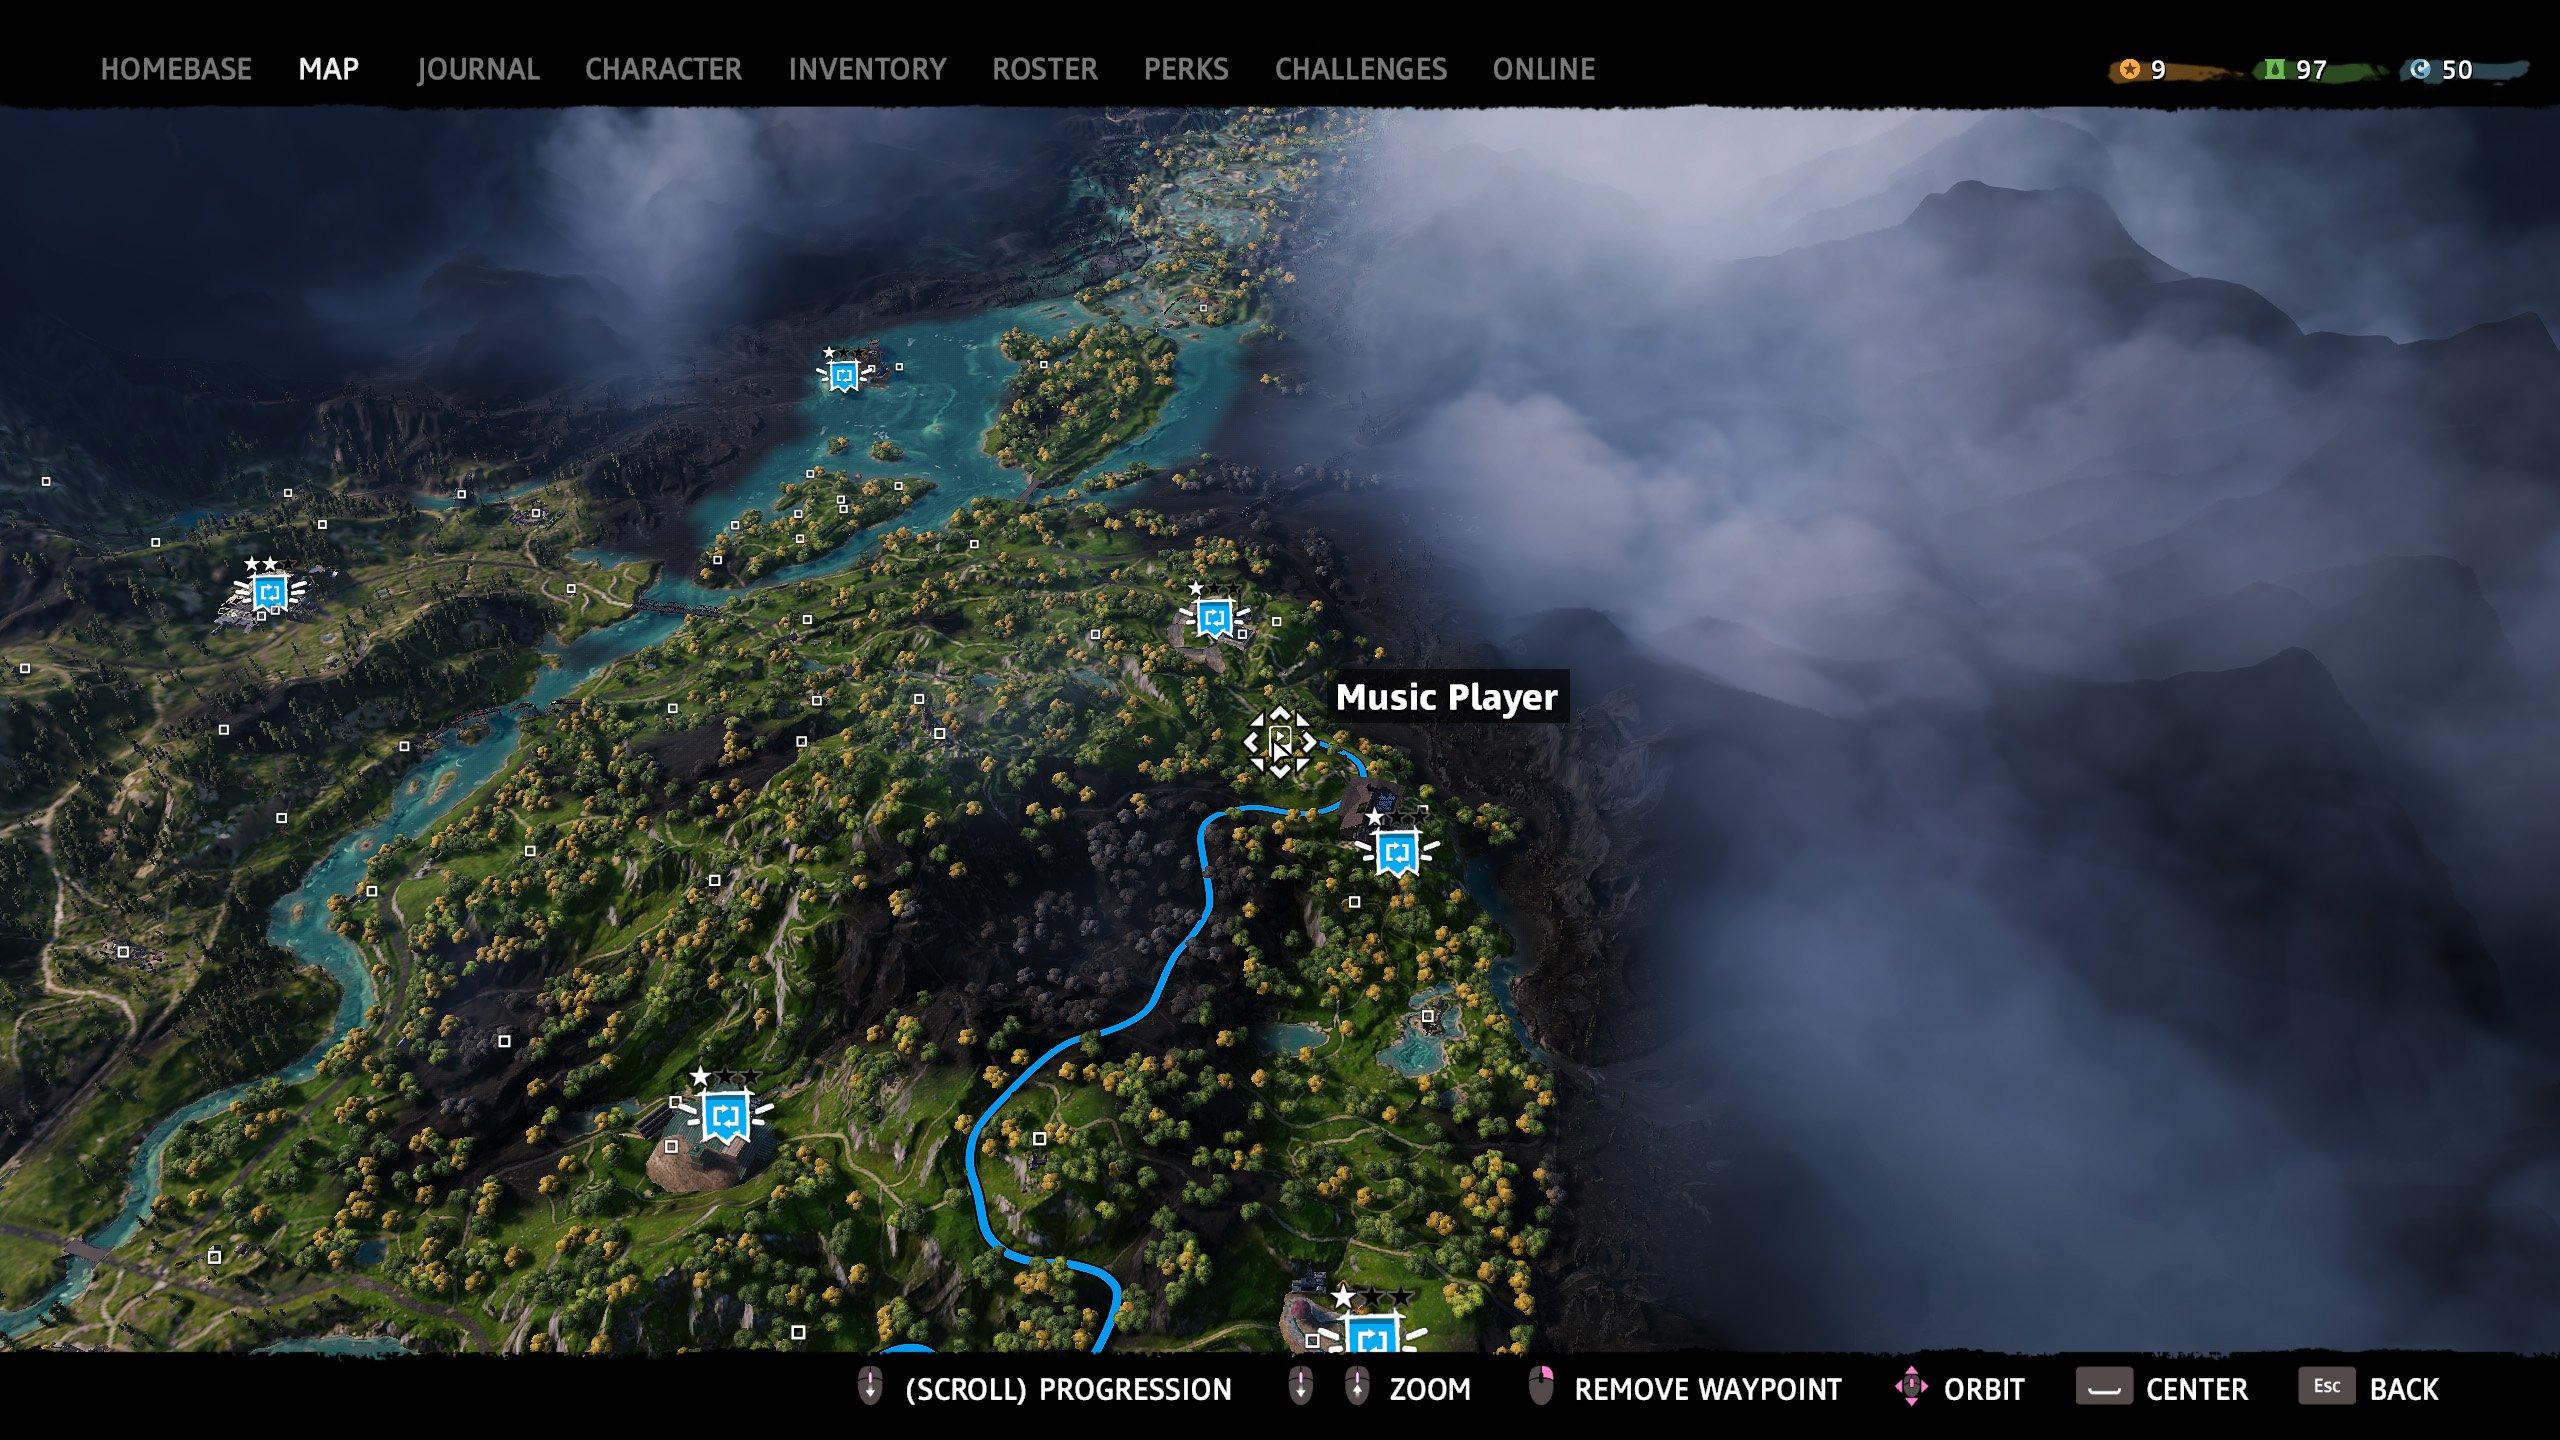 far cry new dawn music player 9 map